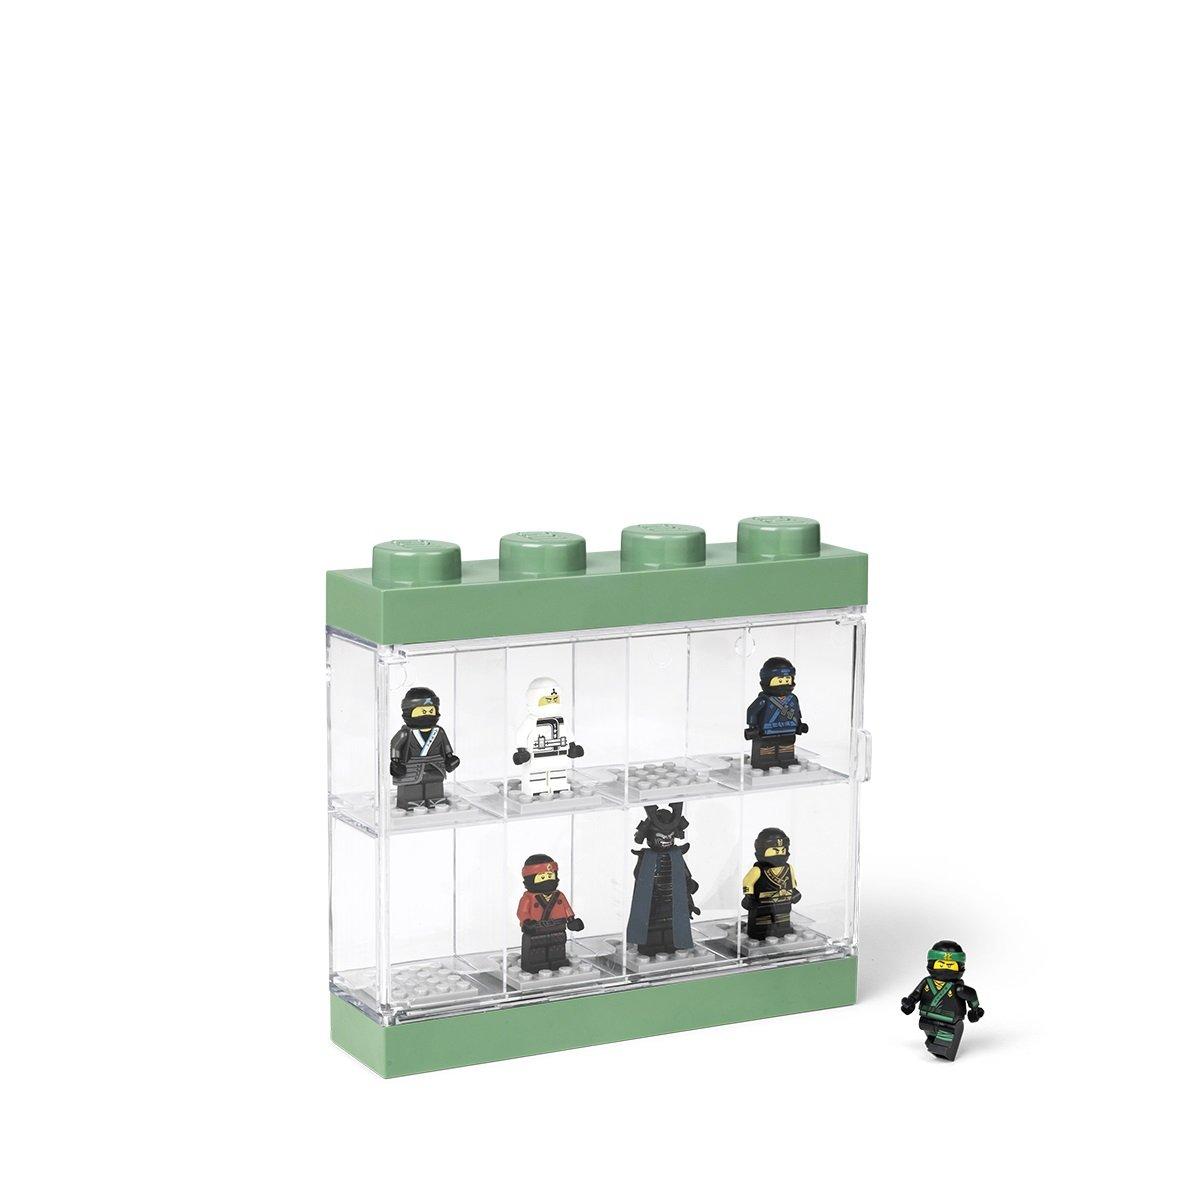 Ninjago Movie Minifigure Display - ninja toys for kids